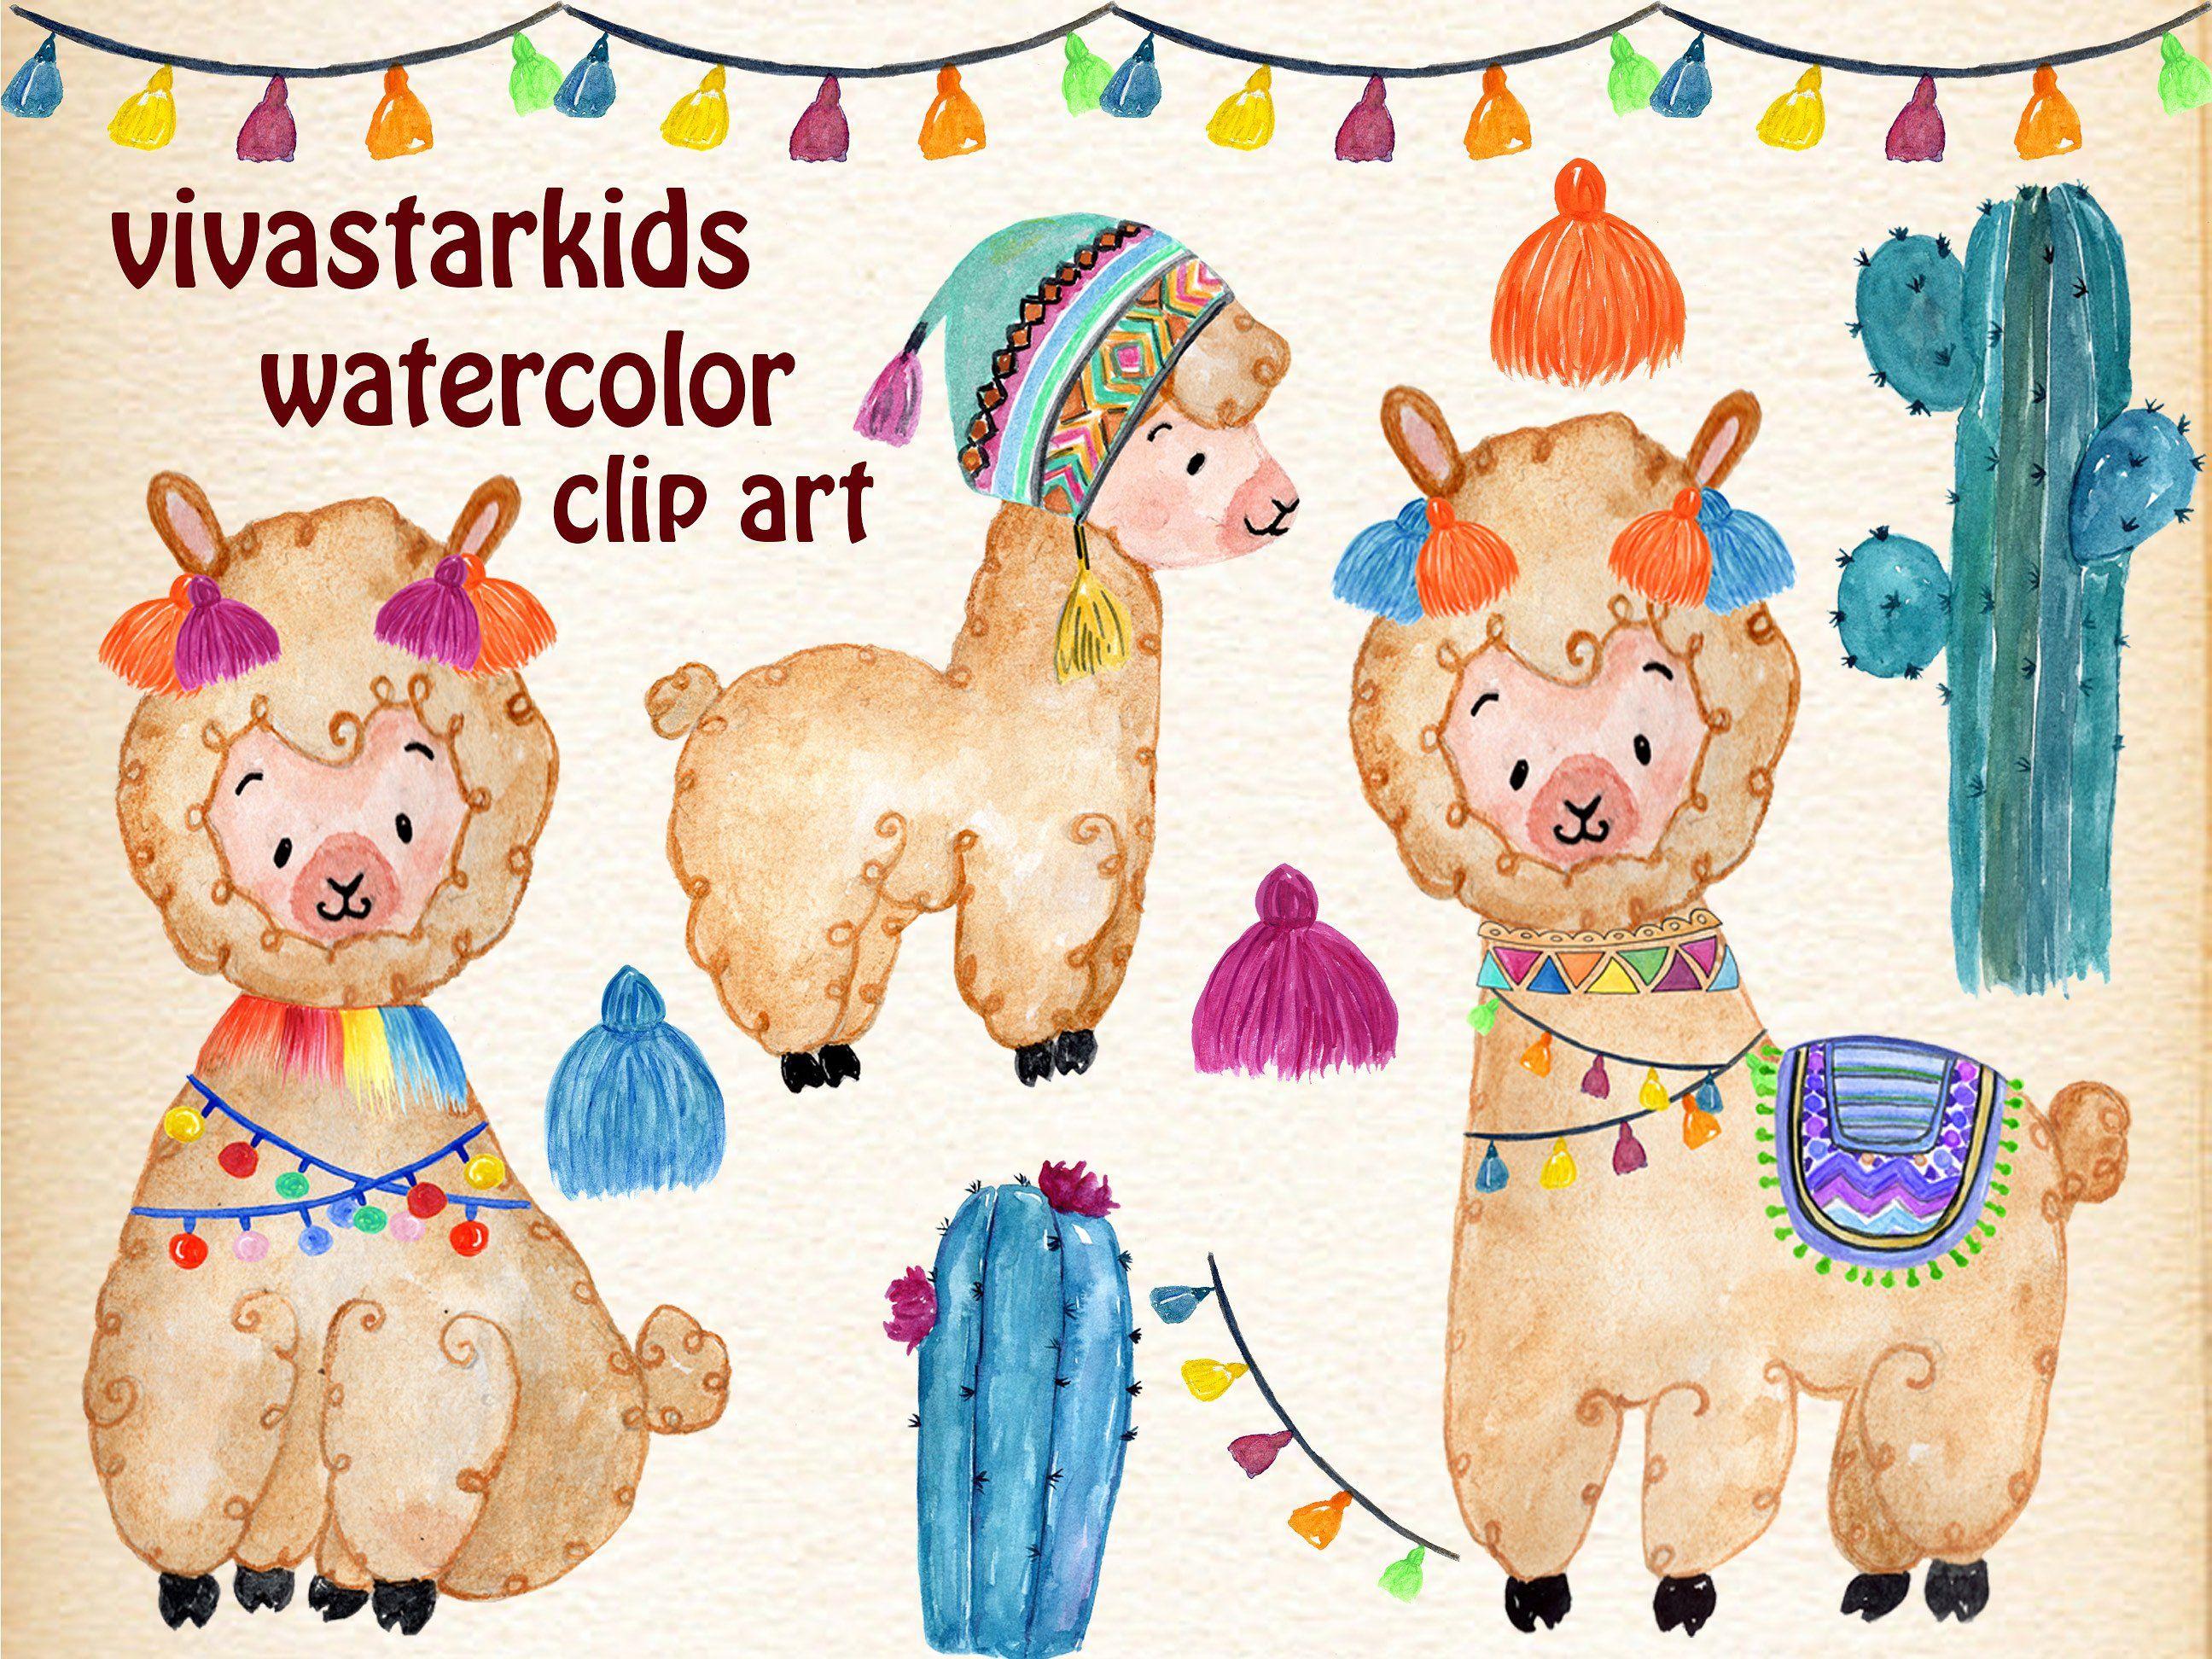 Watercolor Llama Clipart Clip art, Llama clipart, Kids